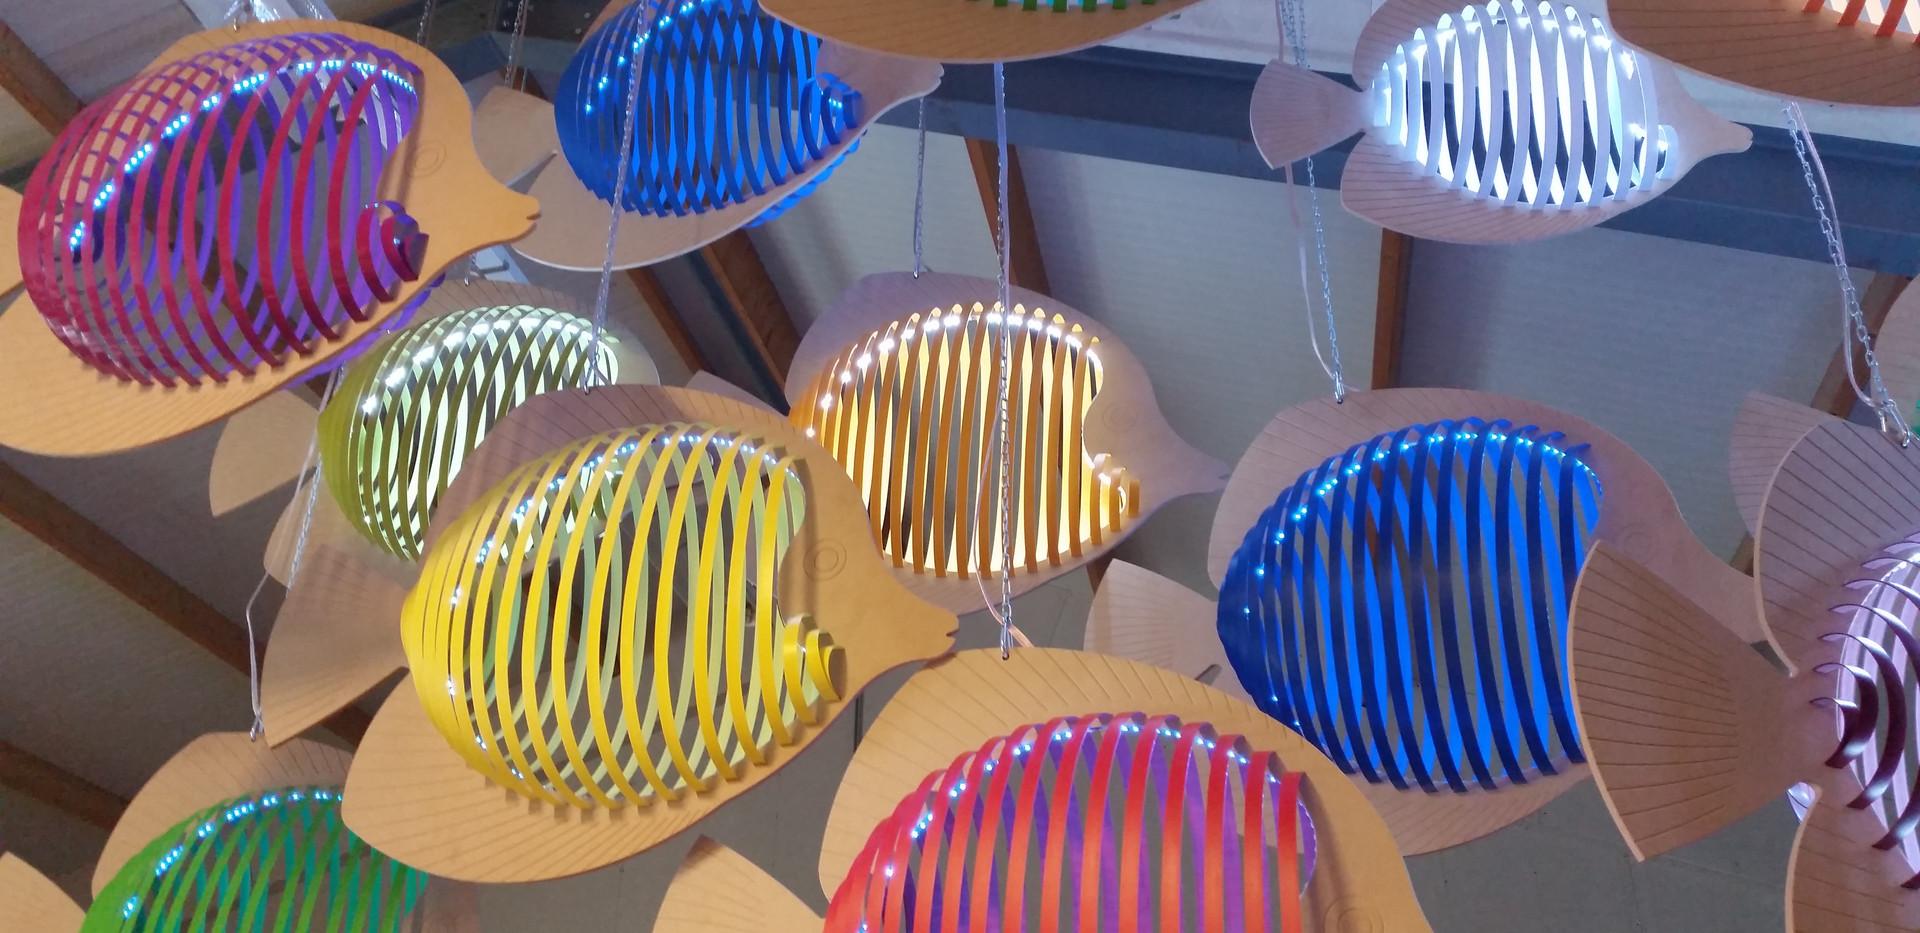 Vissenschool Lamp